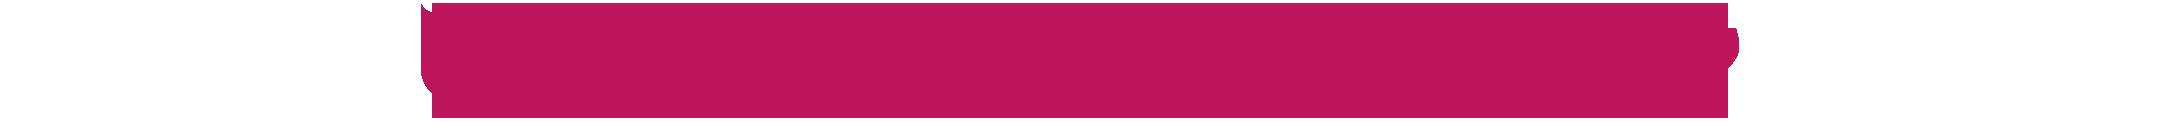 Sponsors-pink.png